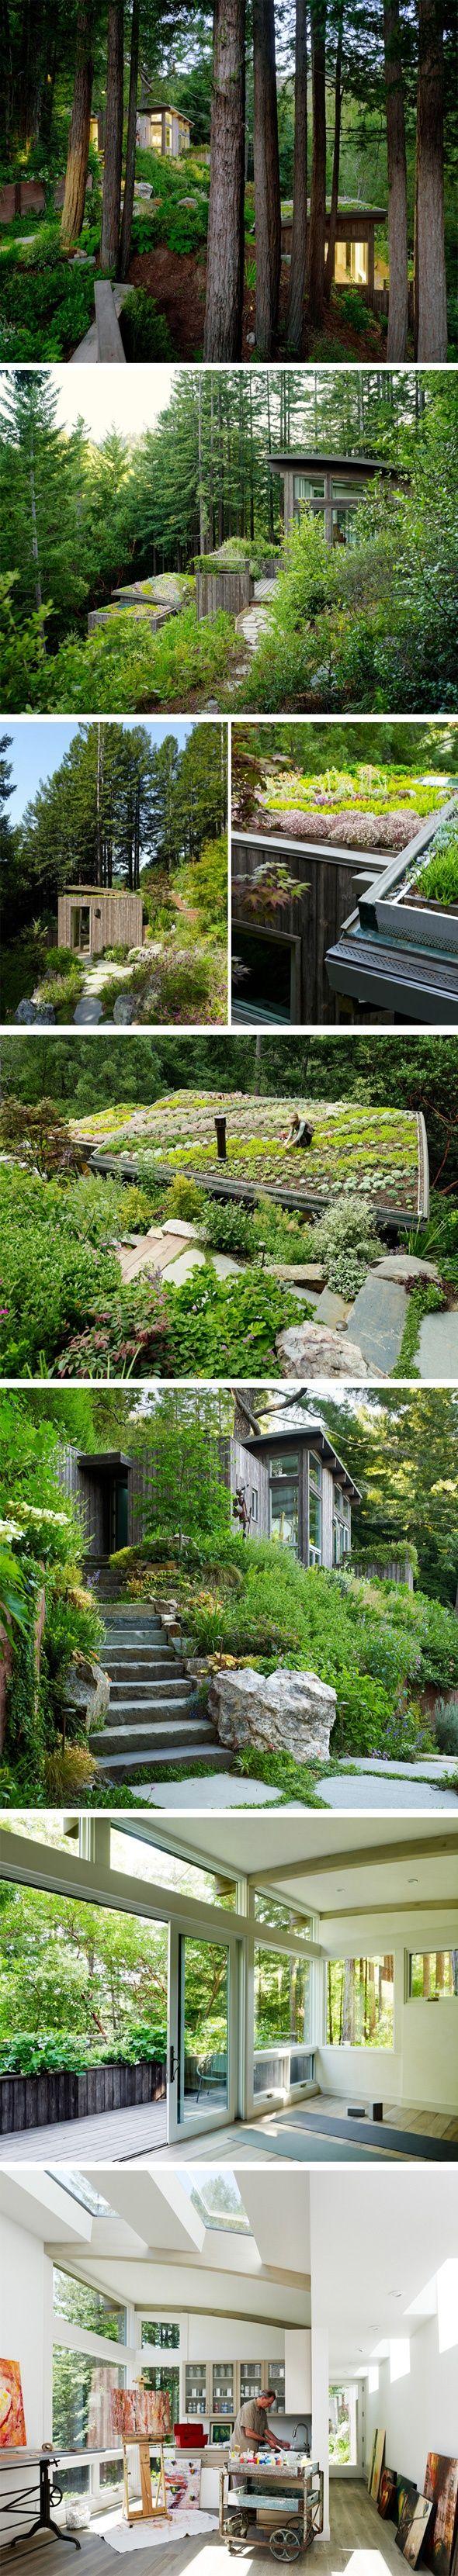 Mill-Valley-Cabins-Feldman-Architecture-2